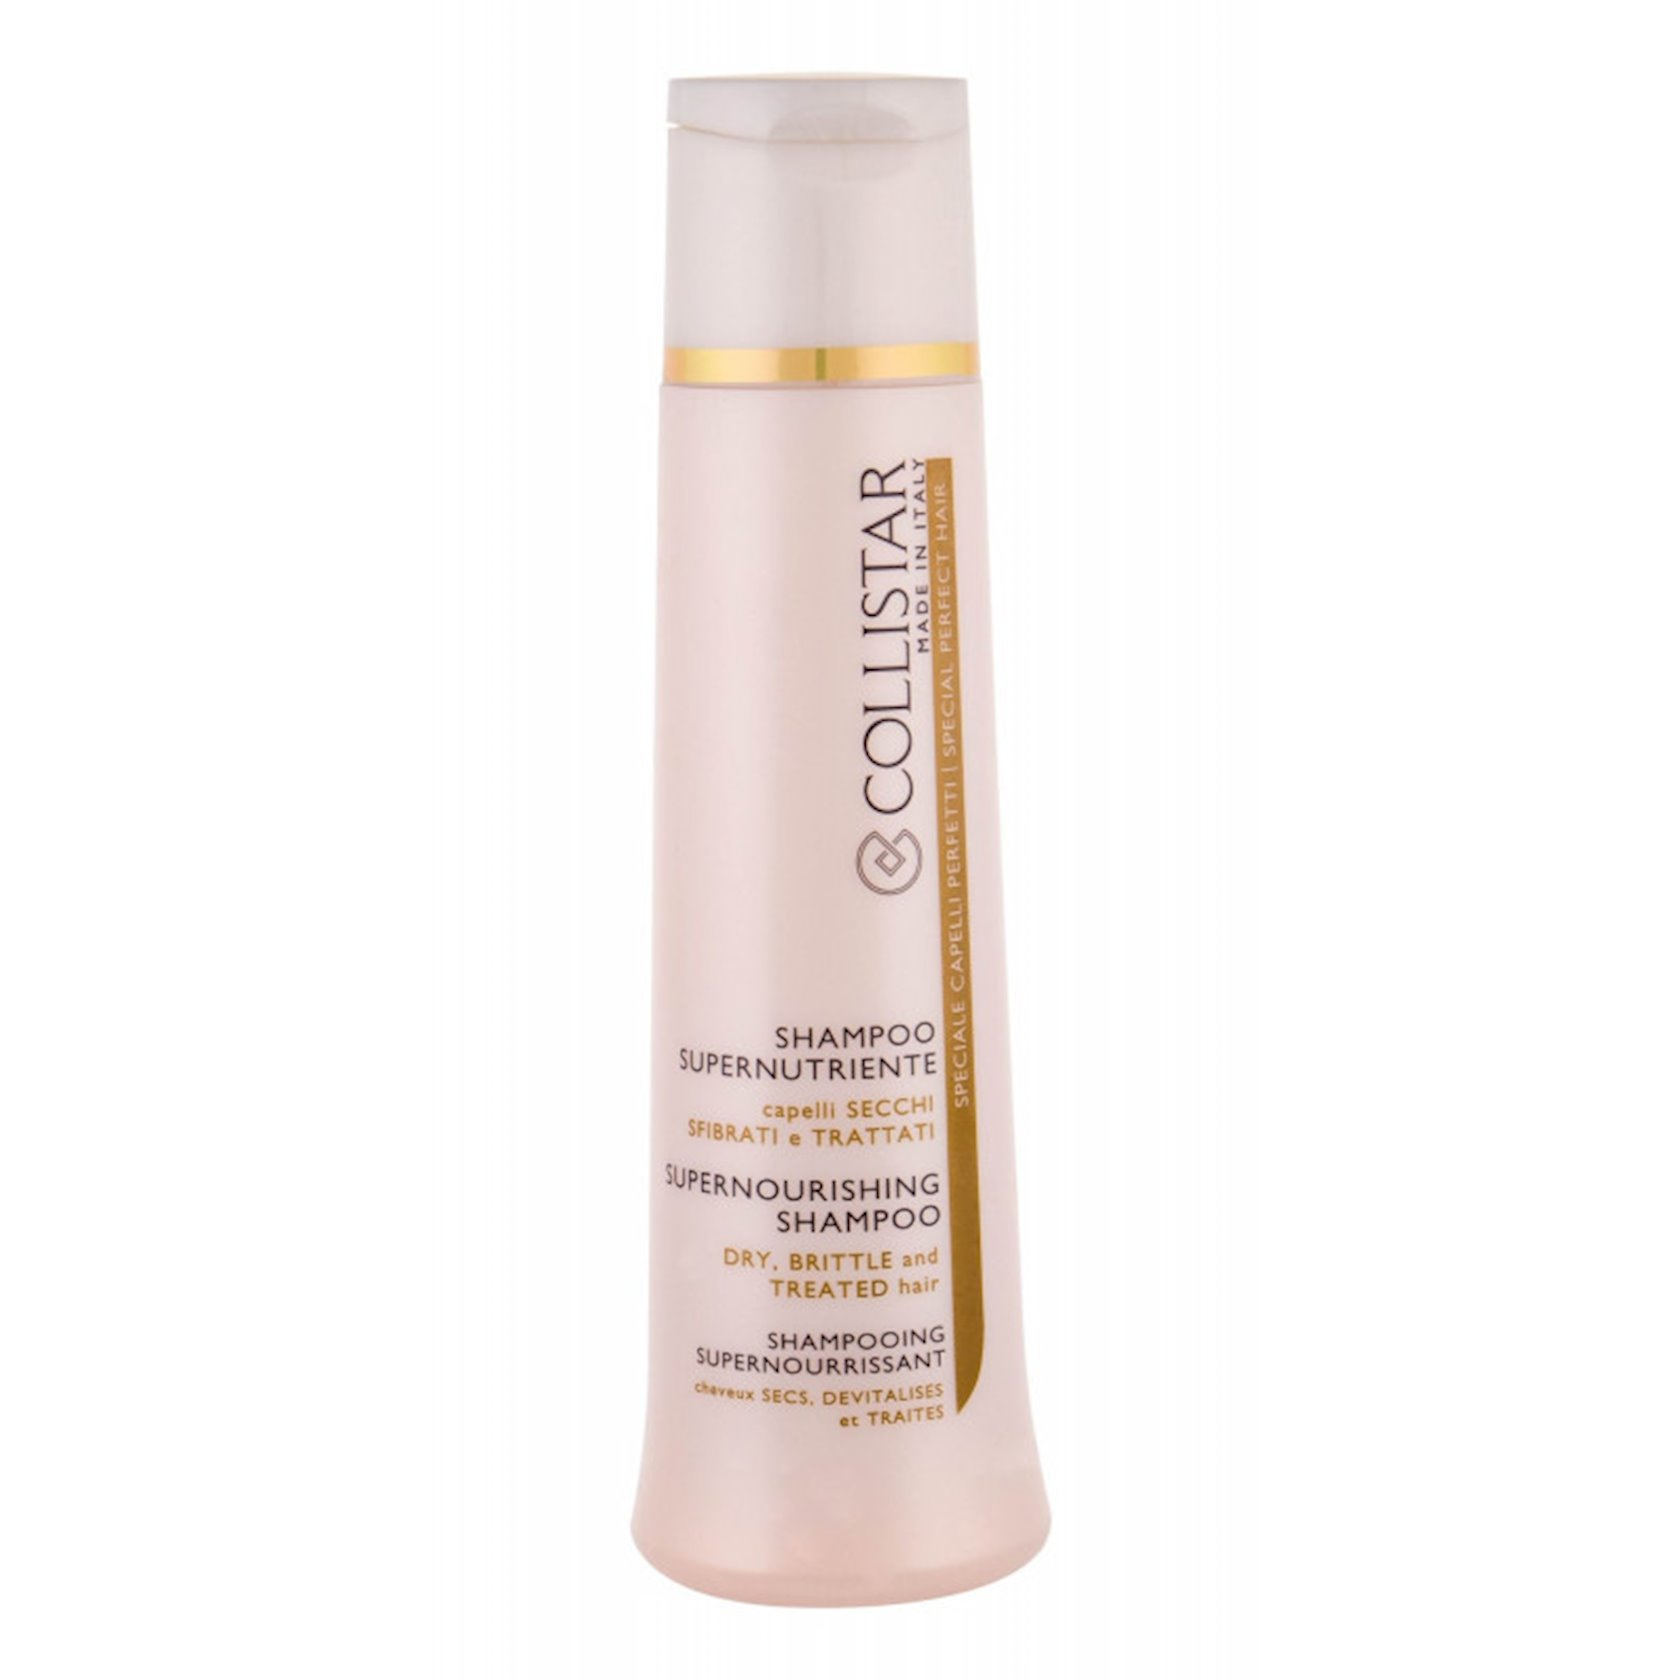 Şampun Collistar Supernourishing Shampoo 250 ml